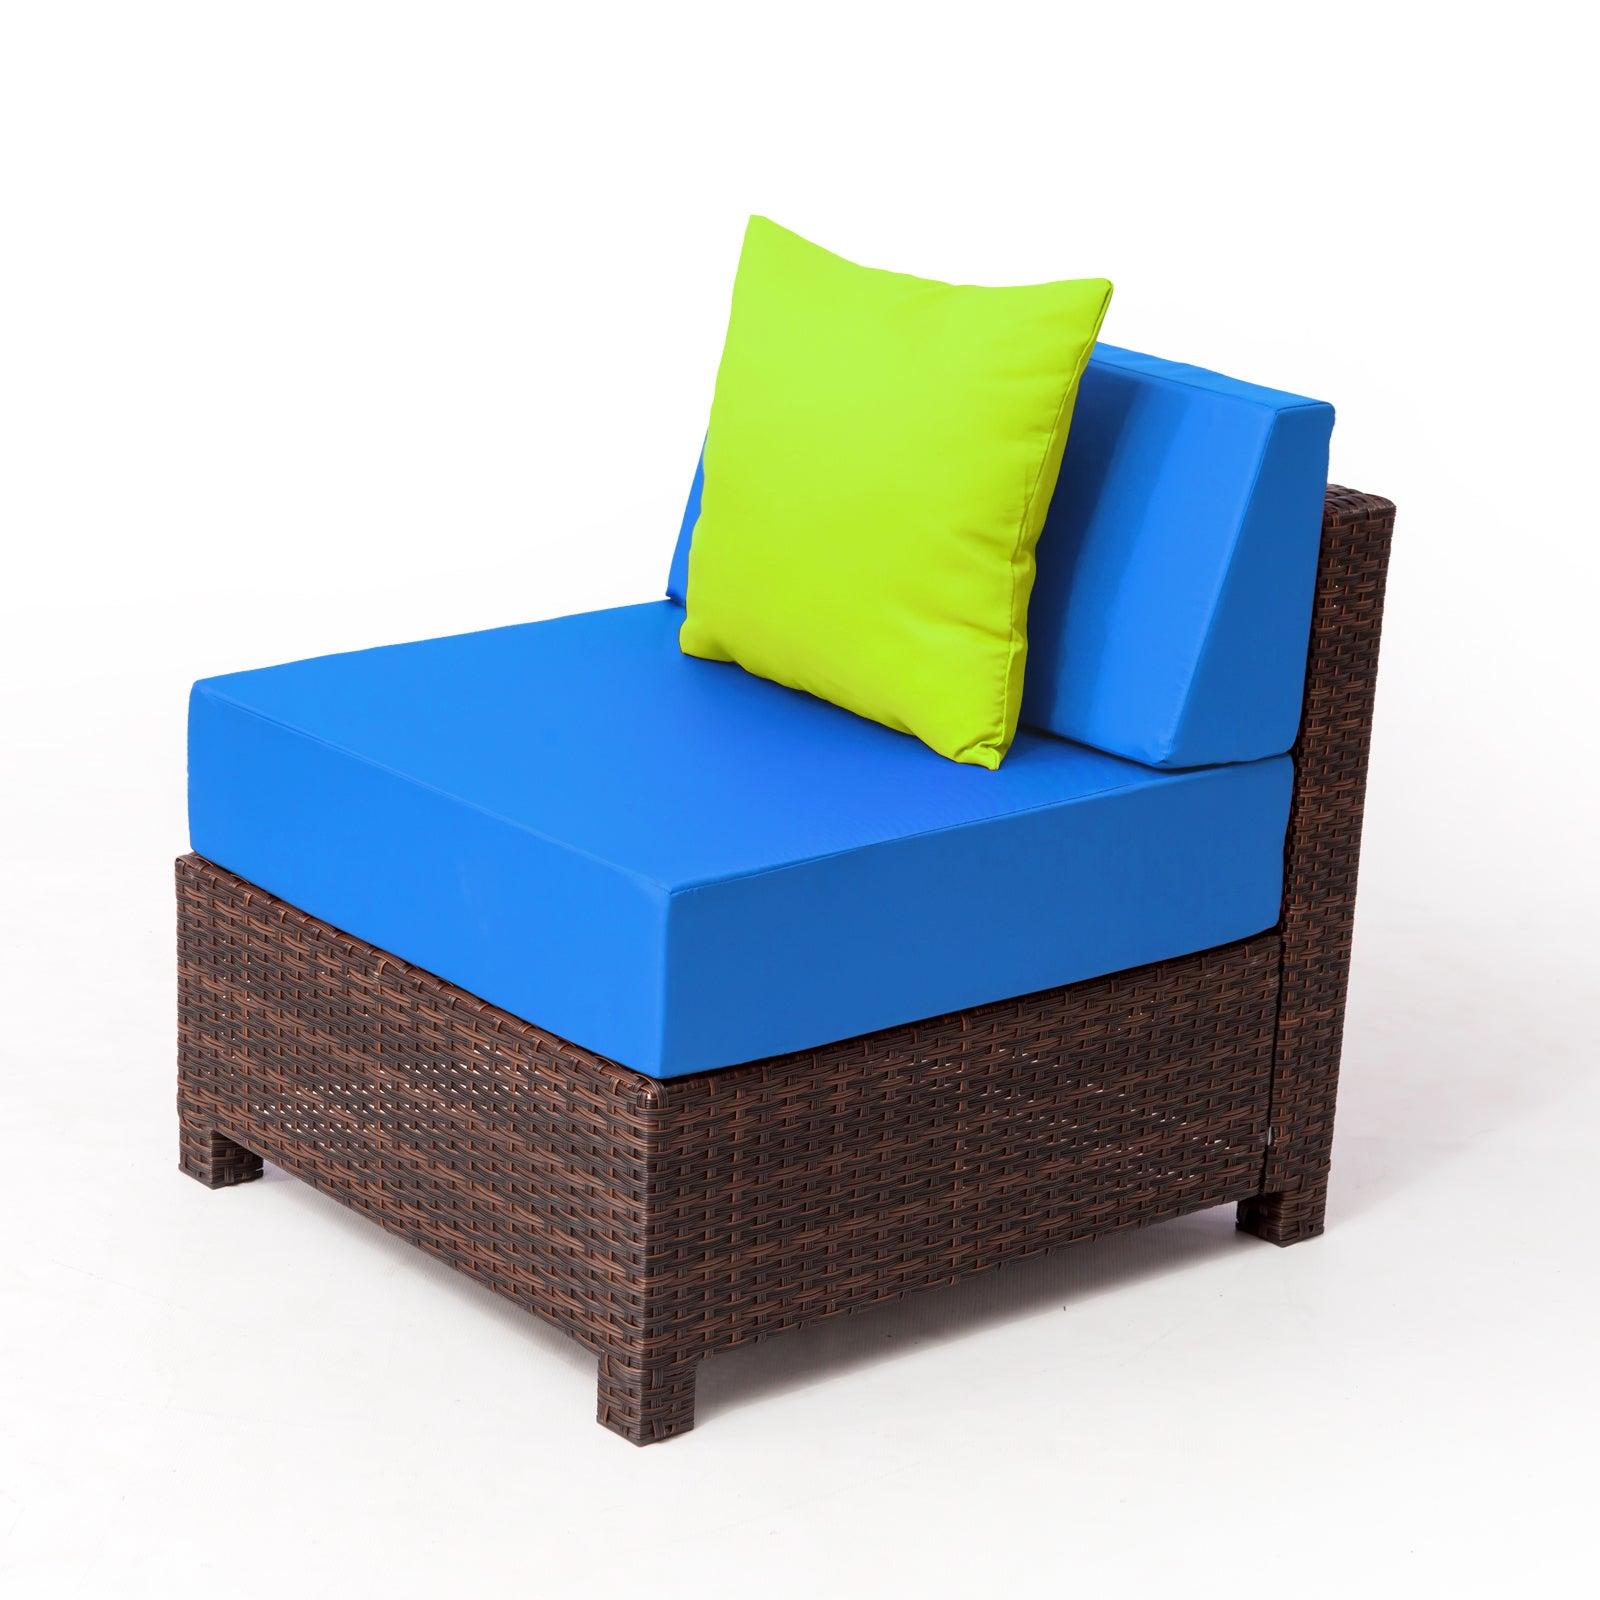 Shop Mcombo 9 Piece Brown Wicker Rattan Patio Furniture Set Blue